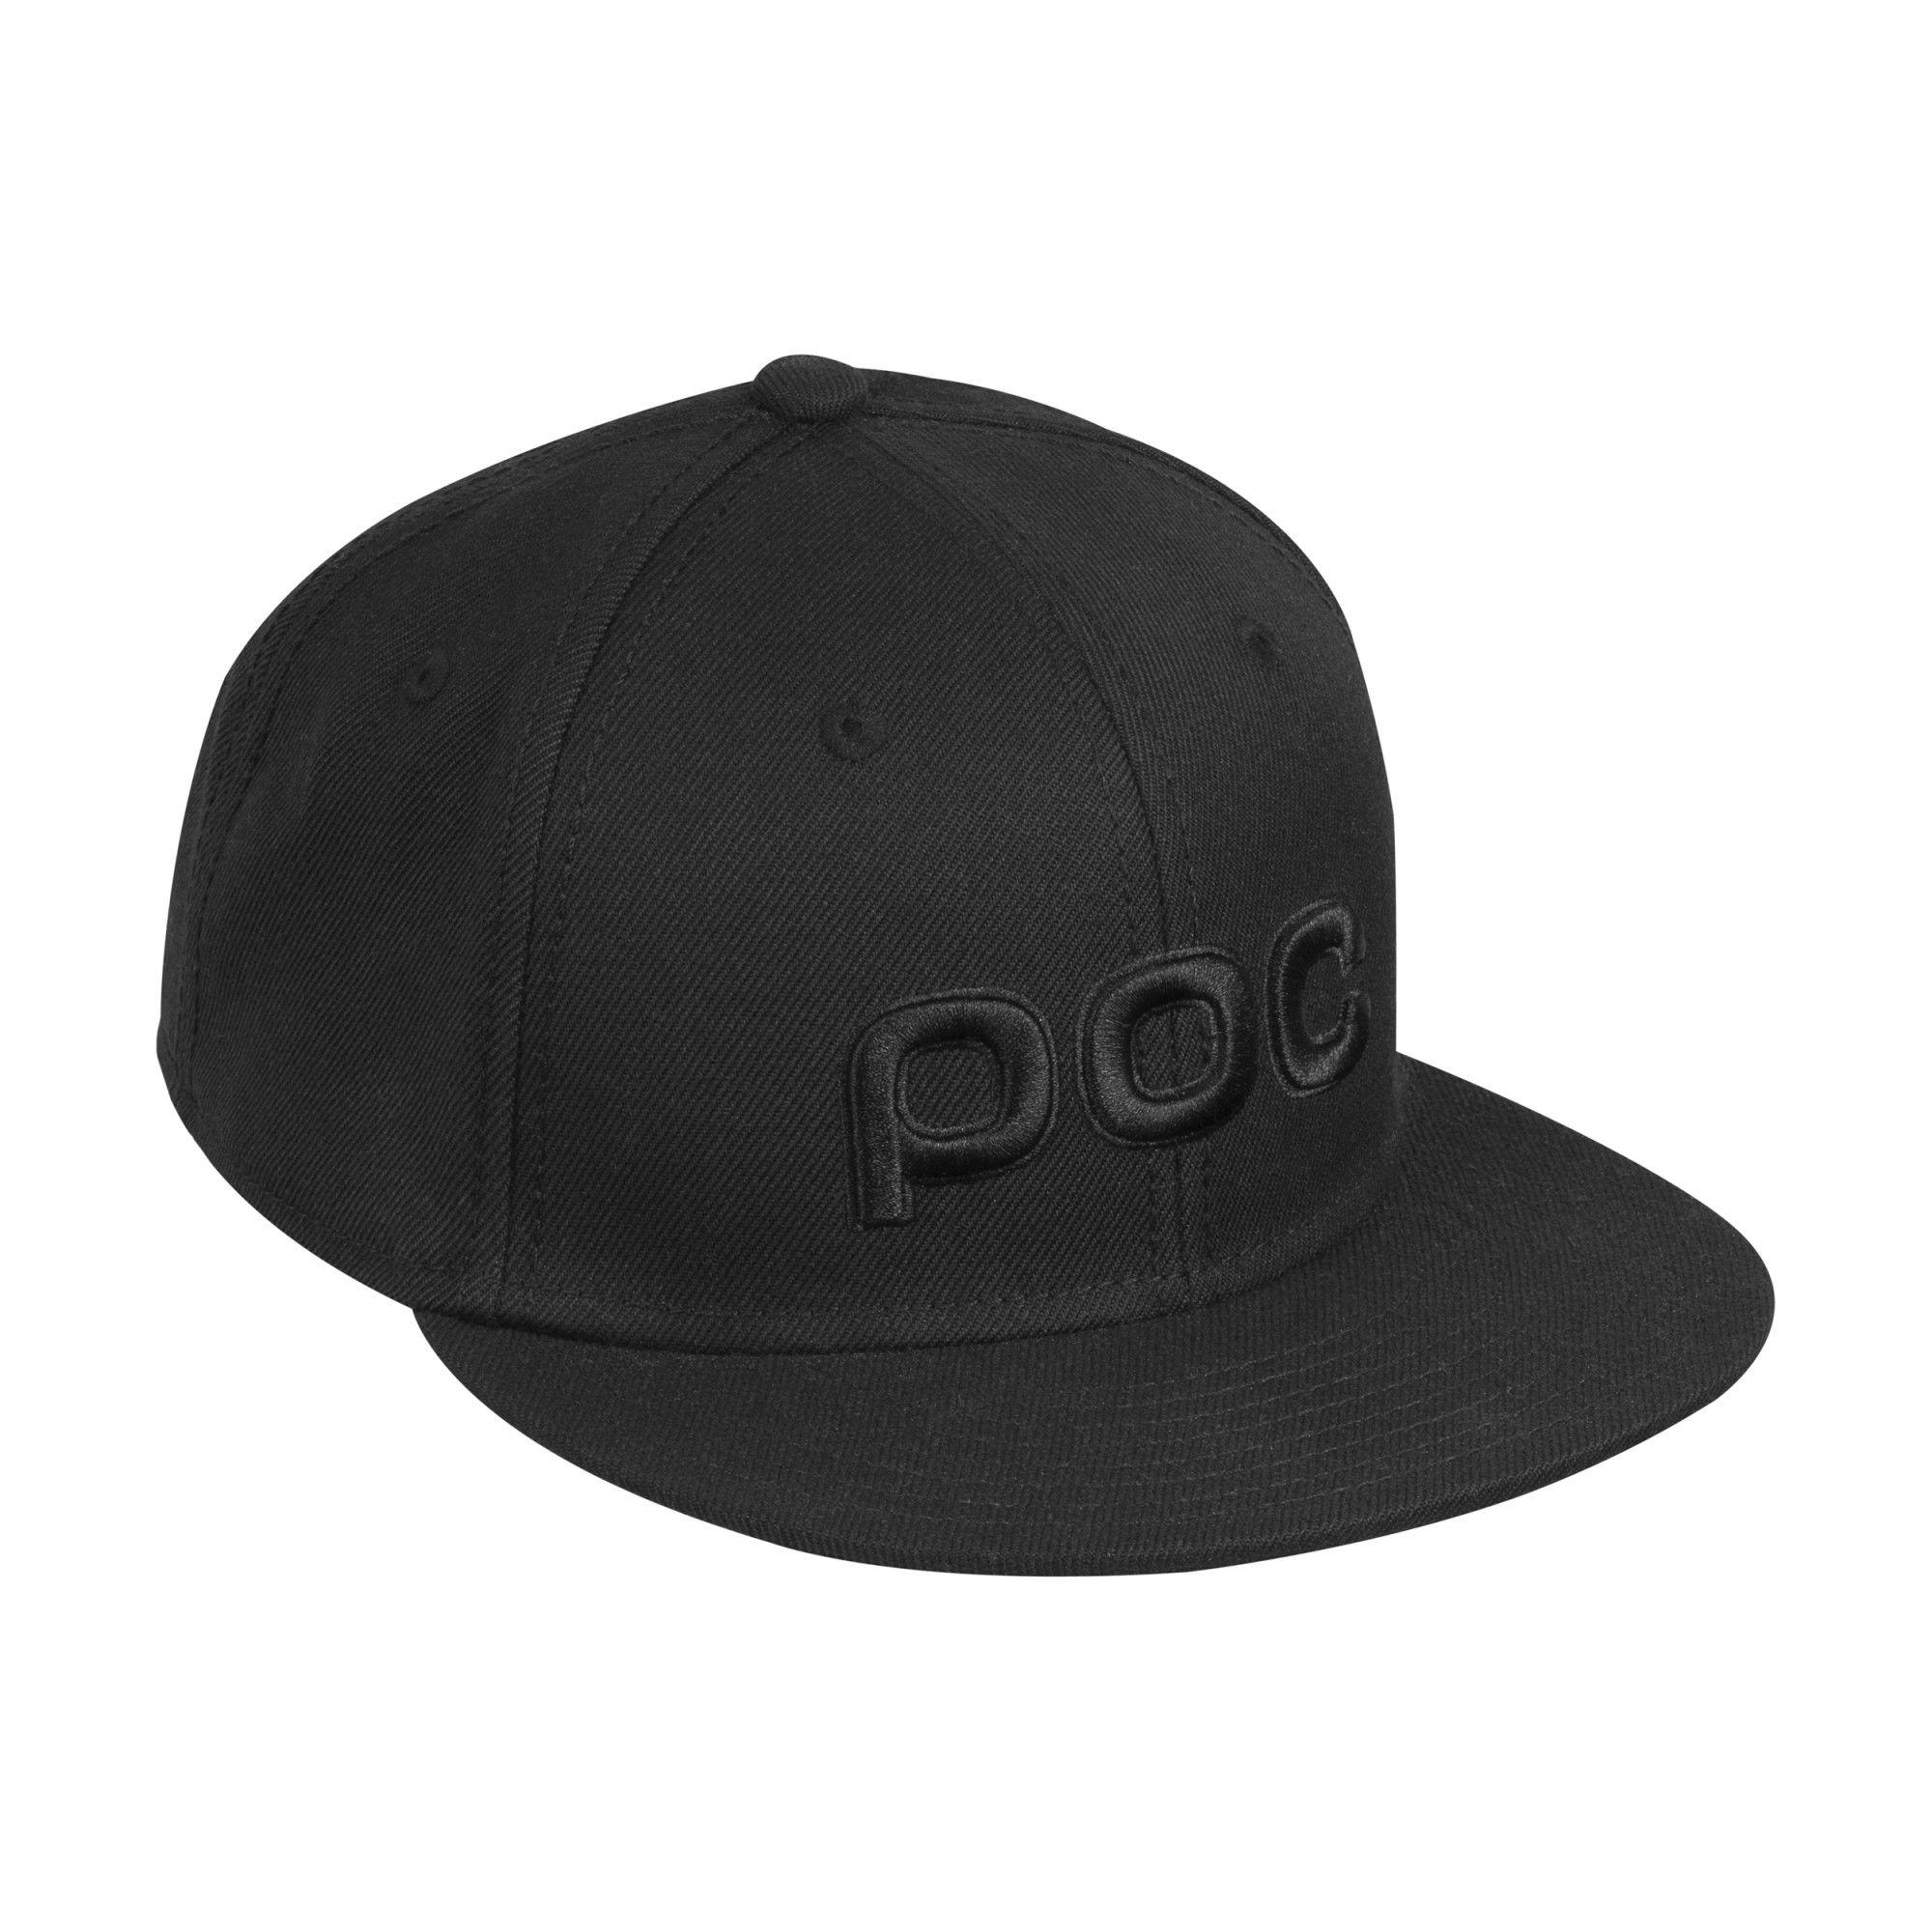 POC Corp Cap Schwarz, One Size -Farbe Uranium Black, One Size